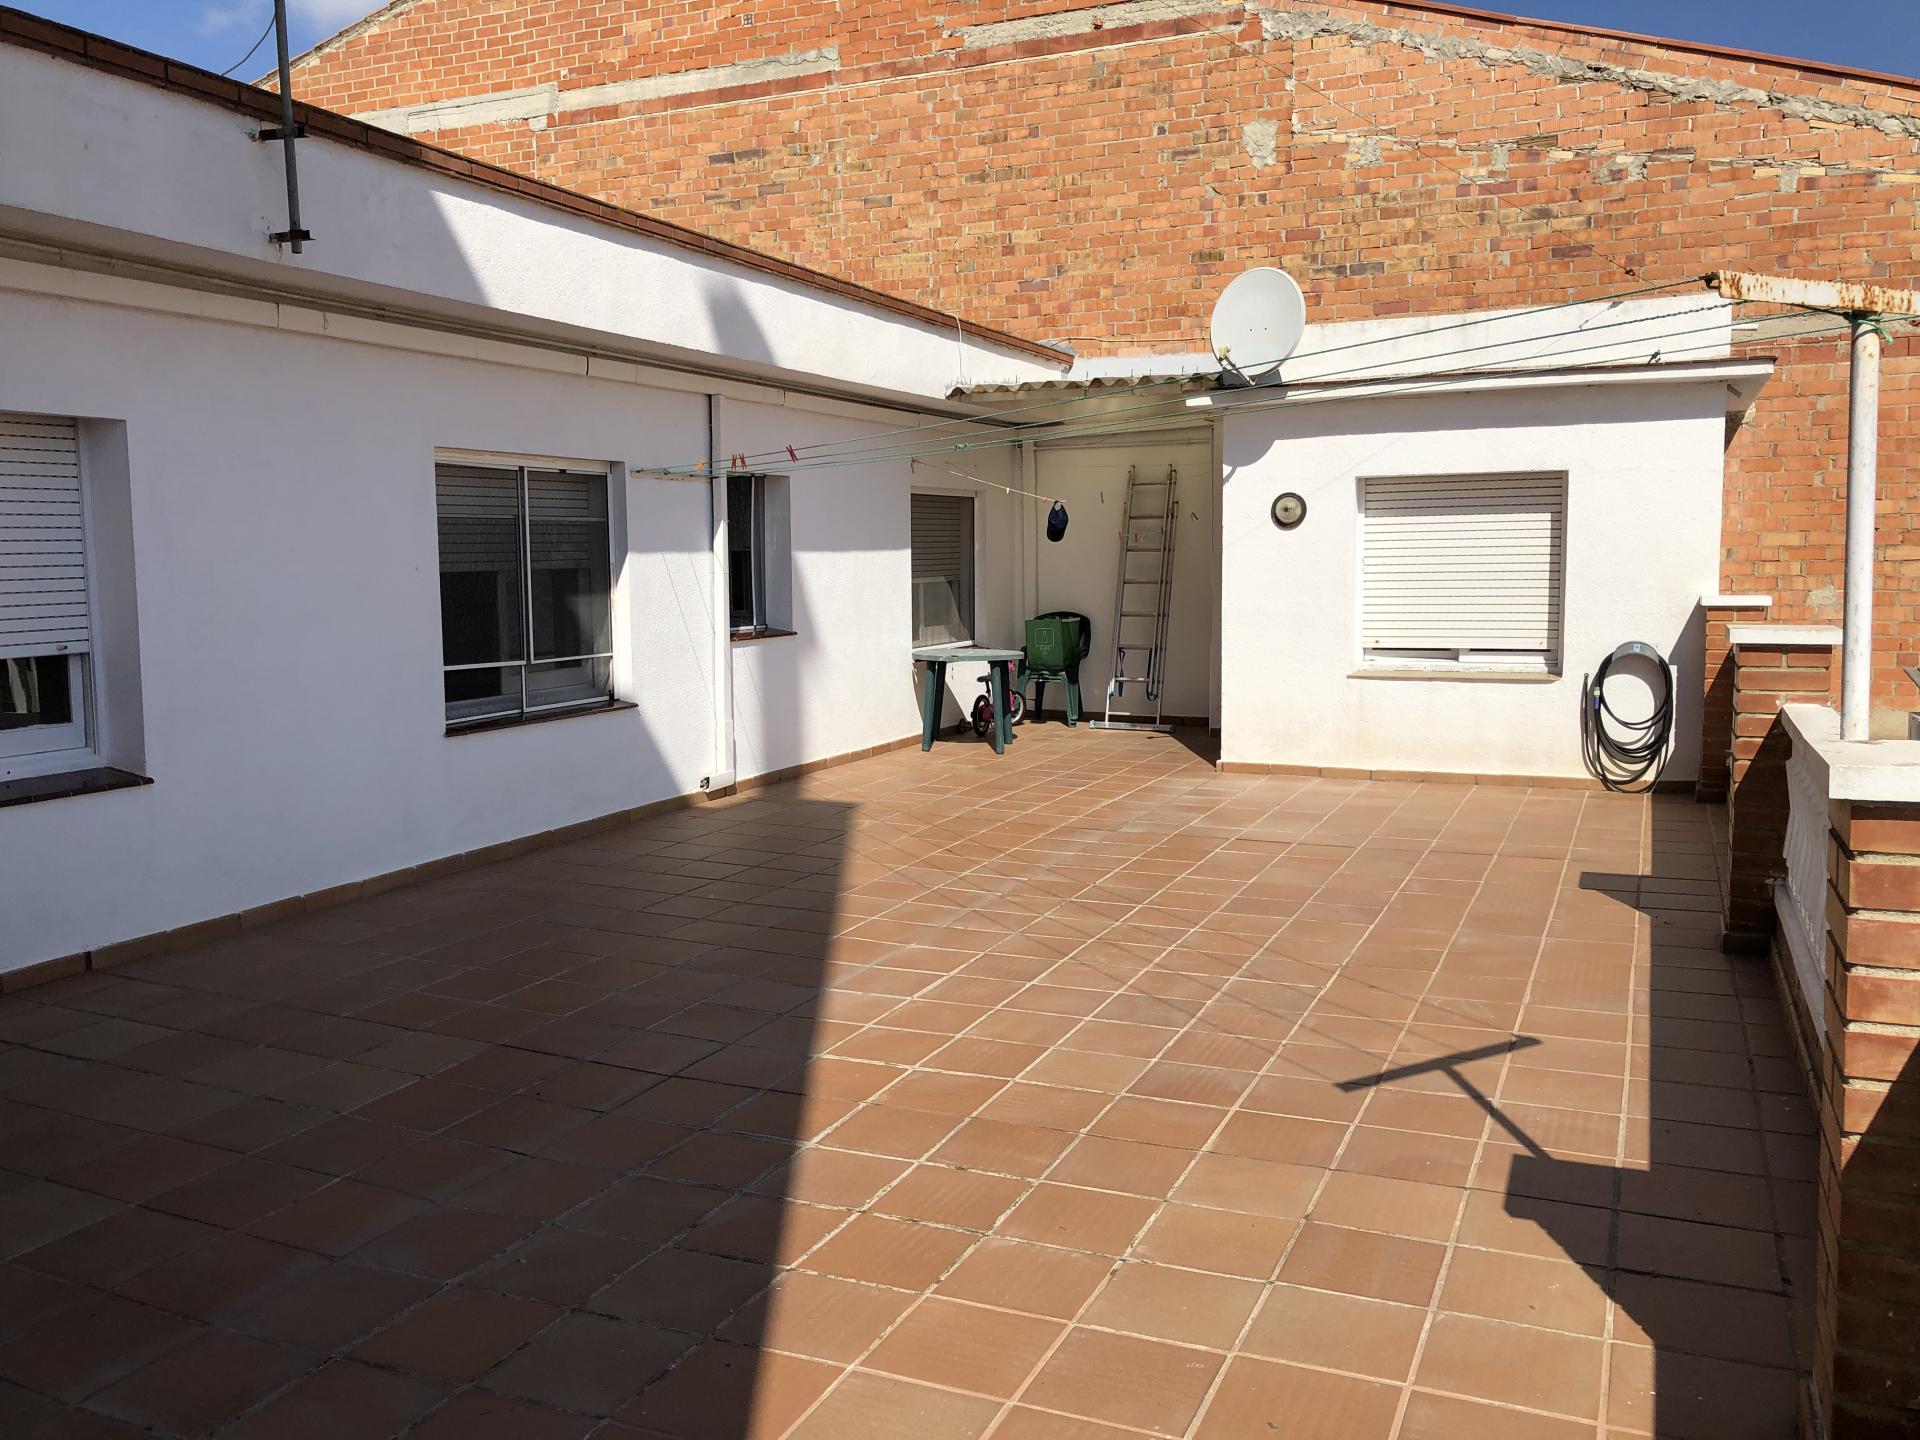 Foto 45 (V-735-2021) - Inmueble en  Venda a Santa Margarida i els Monjos